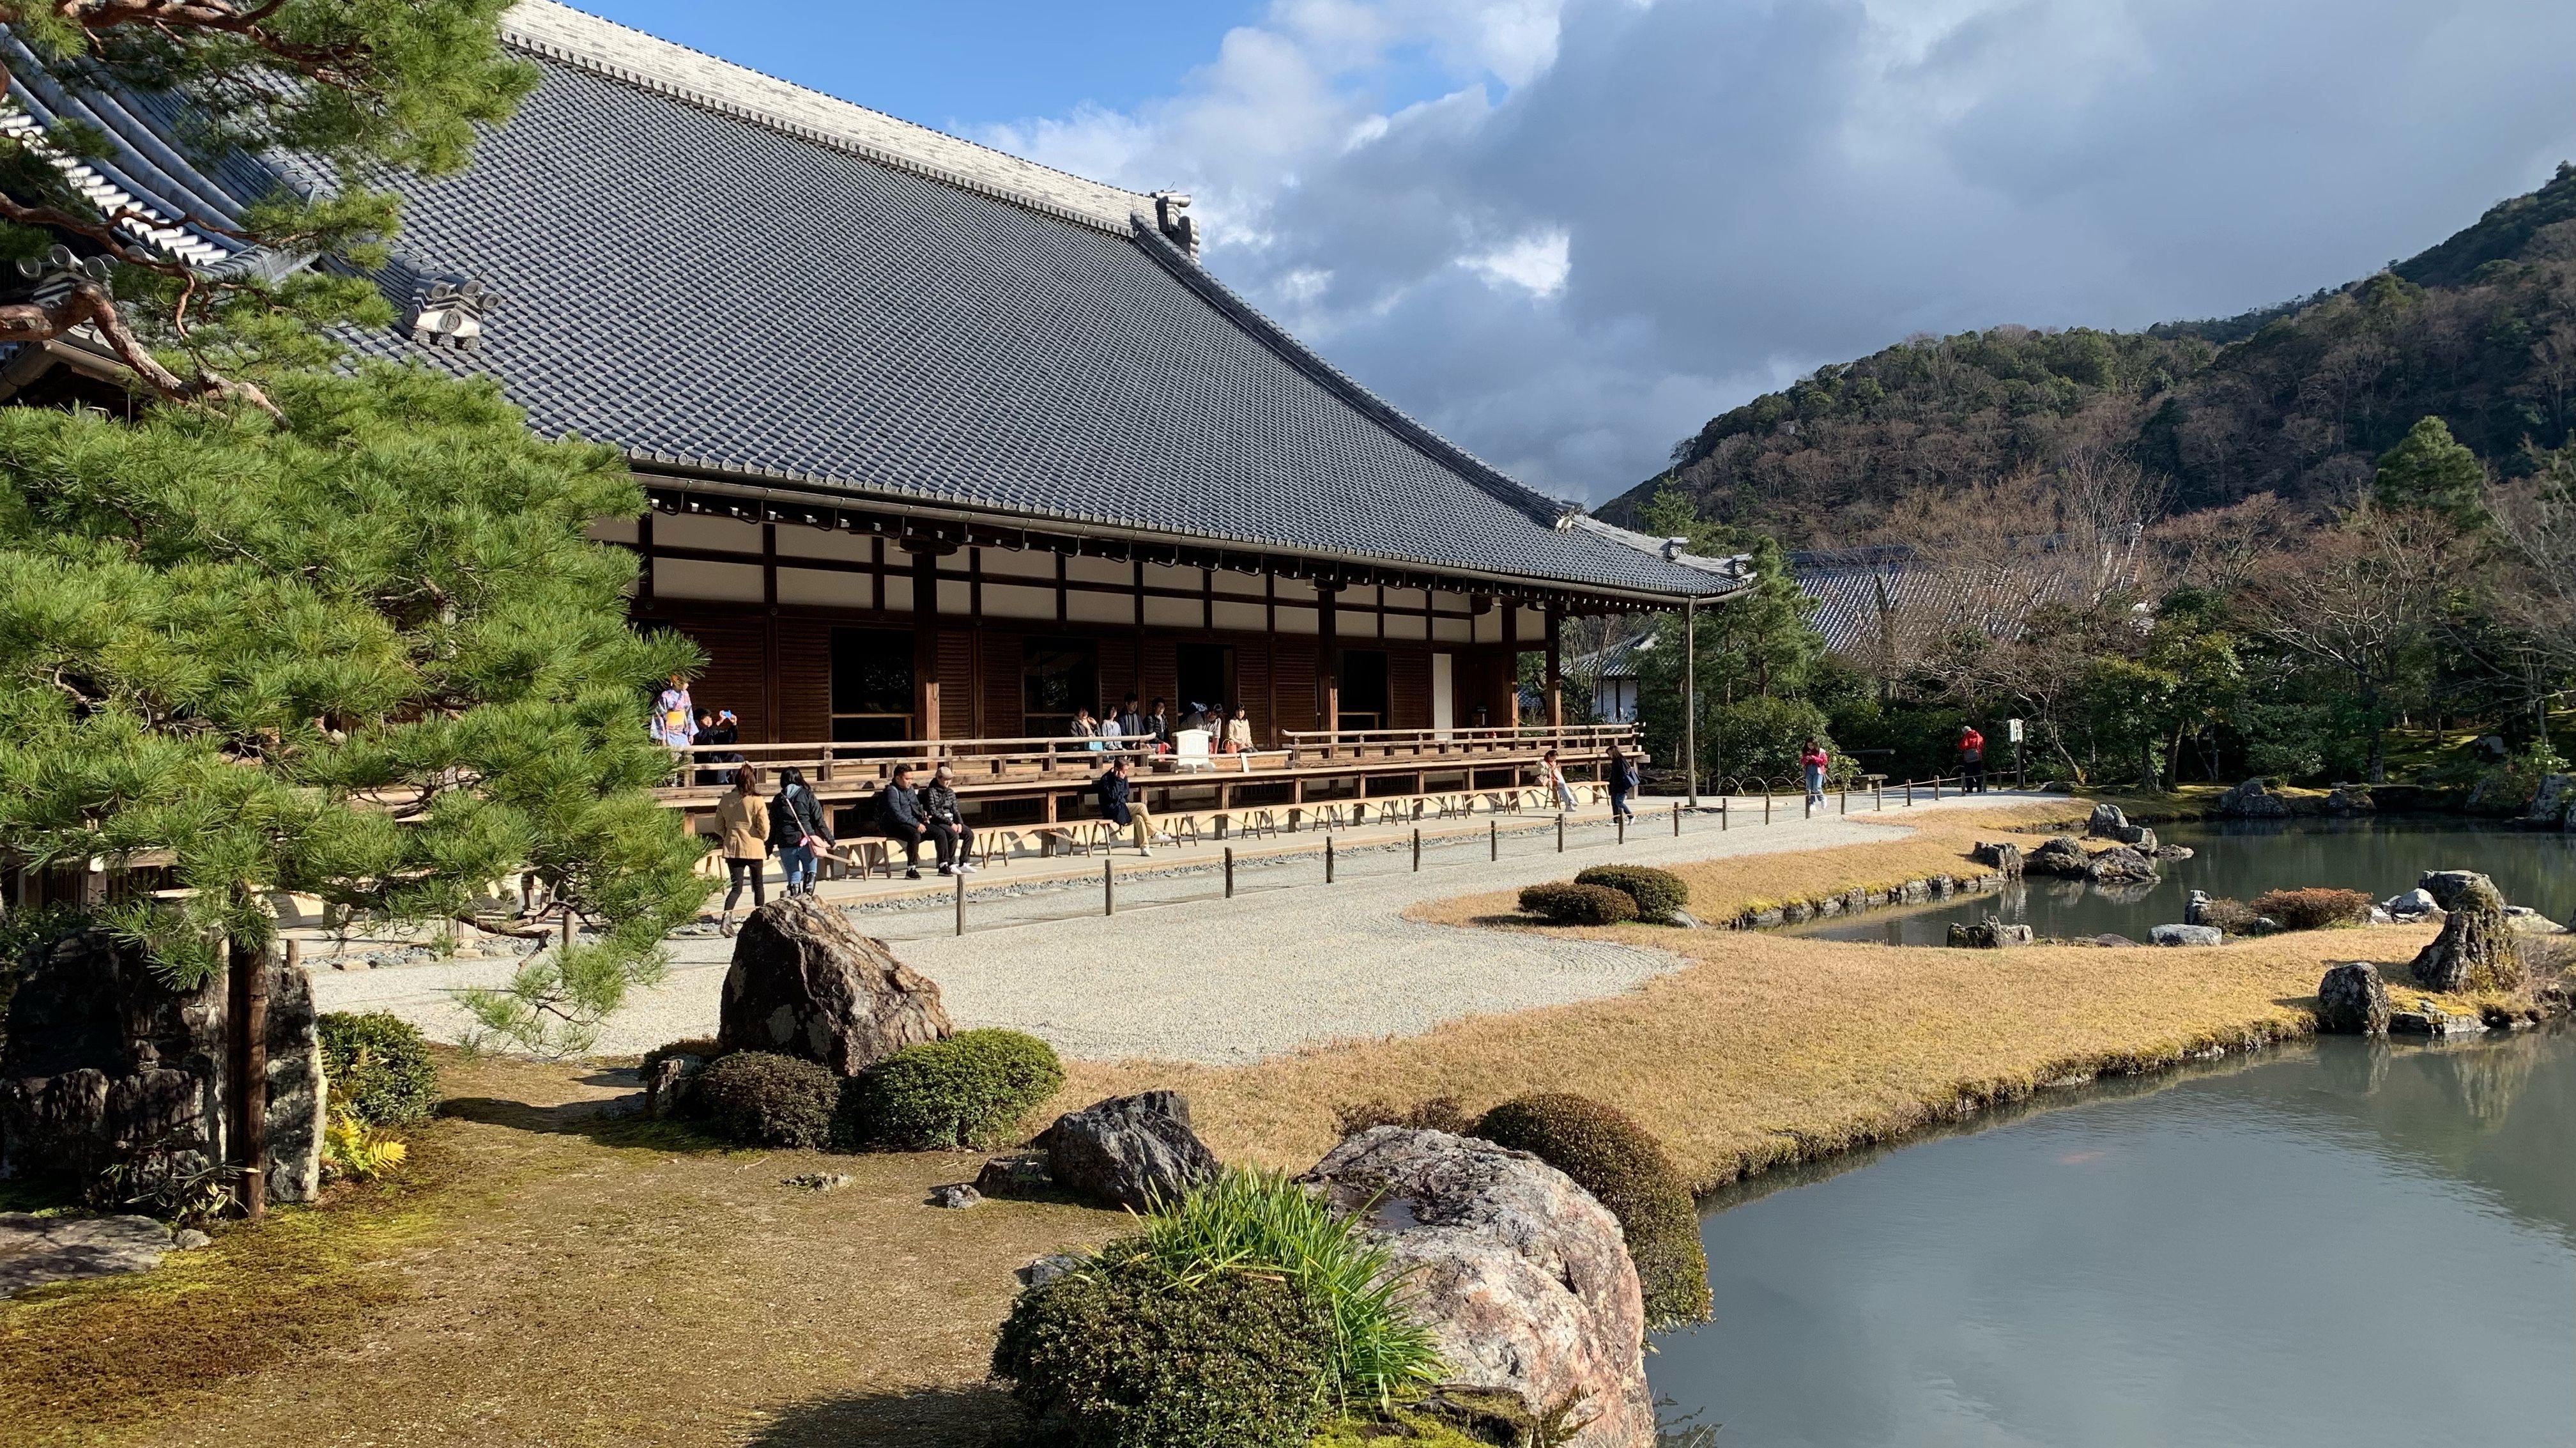 【KSC】Kansai Sightseeing Club